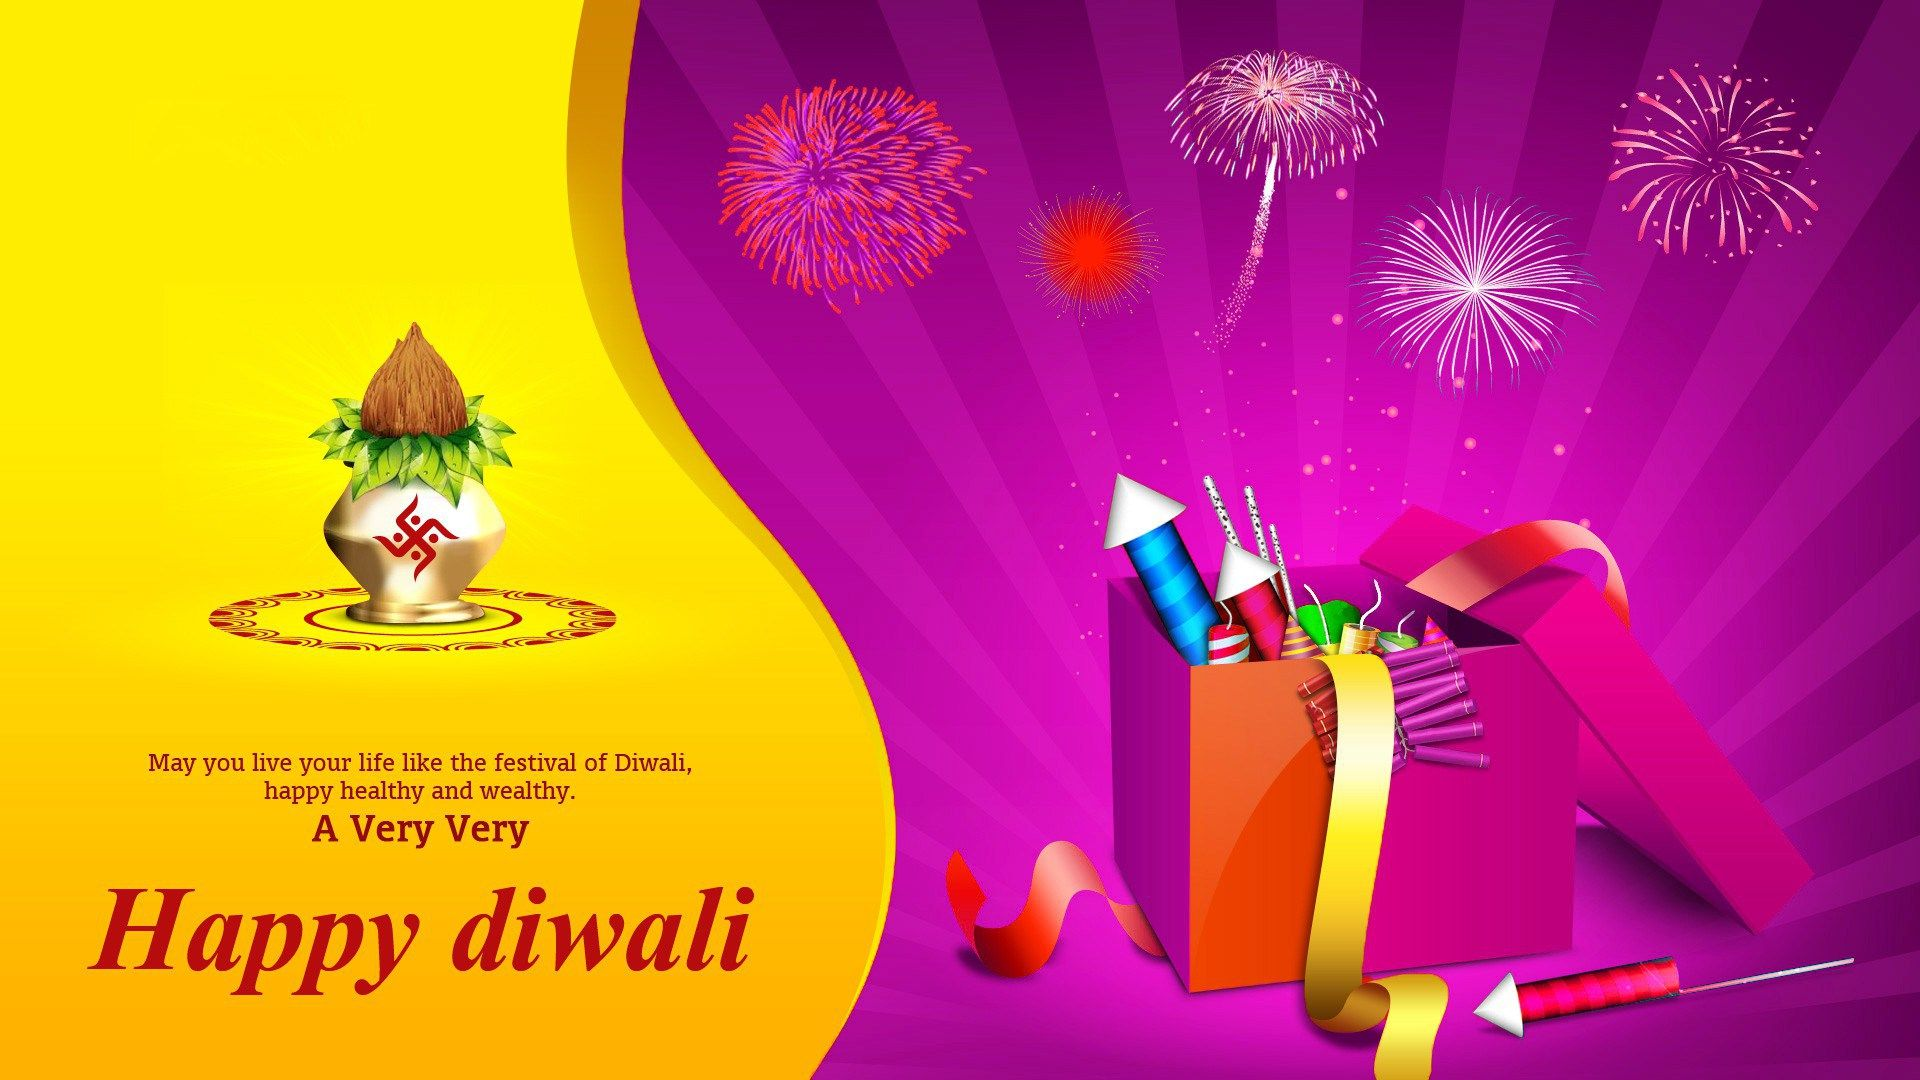 Diwali greeting cards 1 diwali 2016 pinterest diwali diwali kristyandbryce Gallery